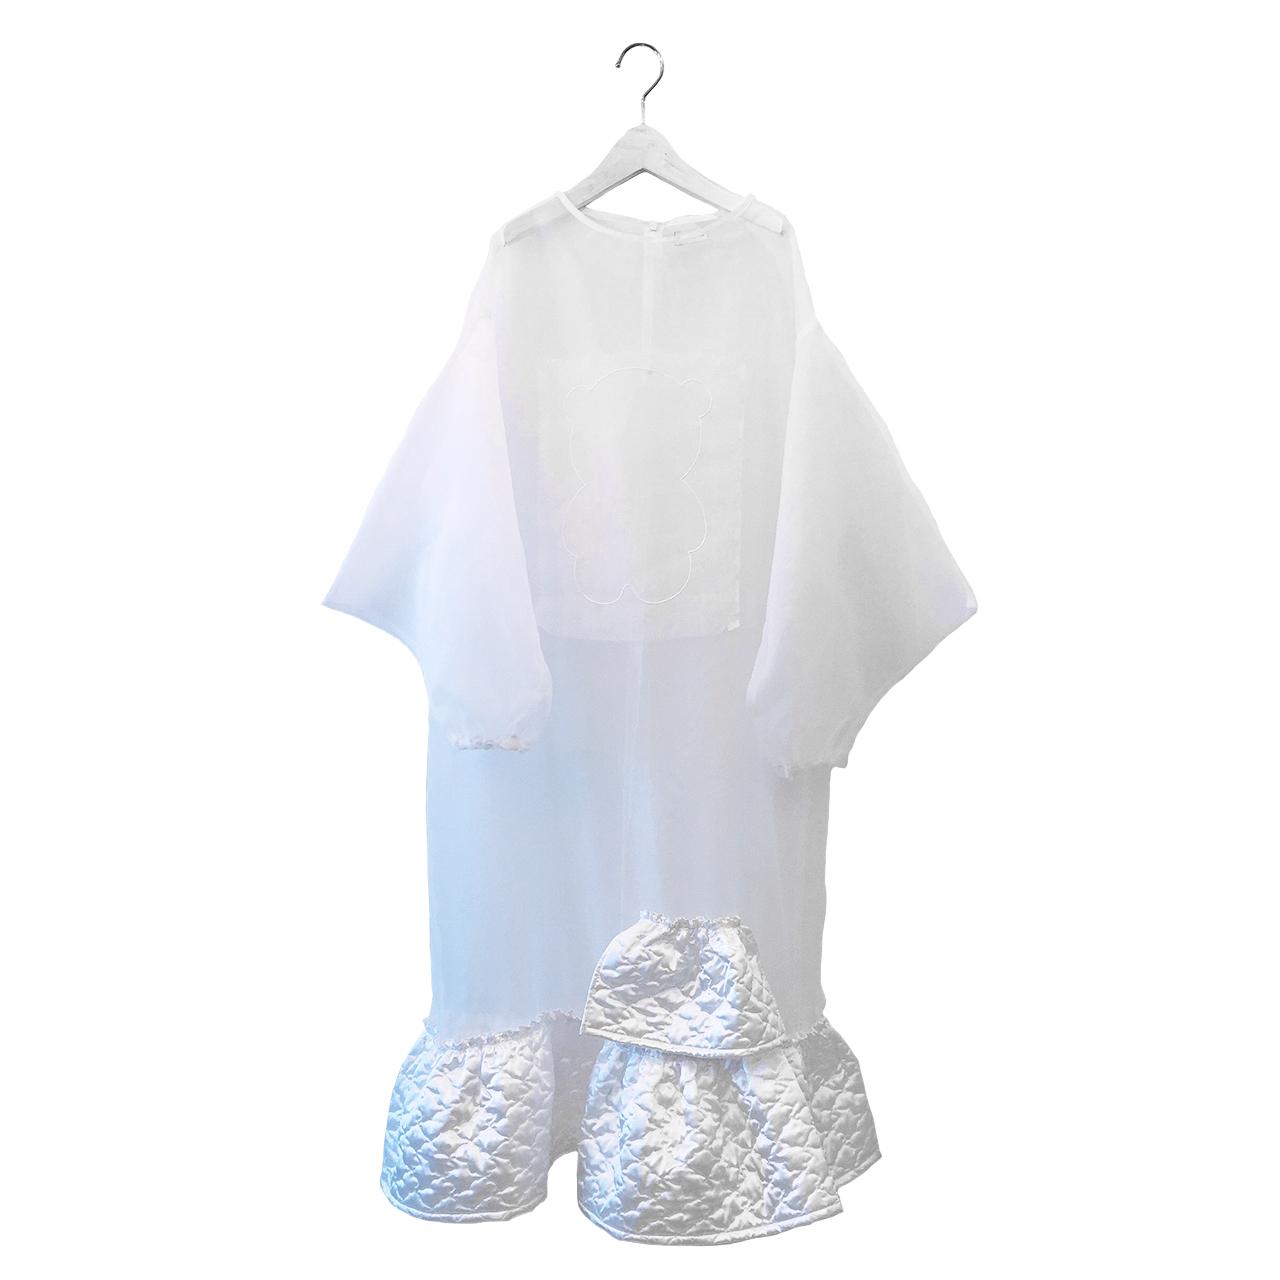 [30%off] frankygrow BEAR EMBROIDERY ORGANDY DRESS WHITE WOMEN franky grow フランキーグロウ\ワンピース